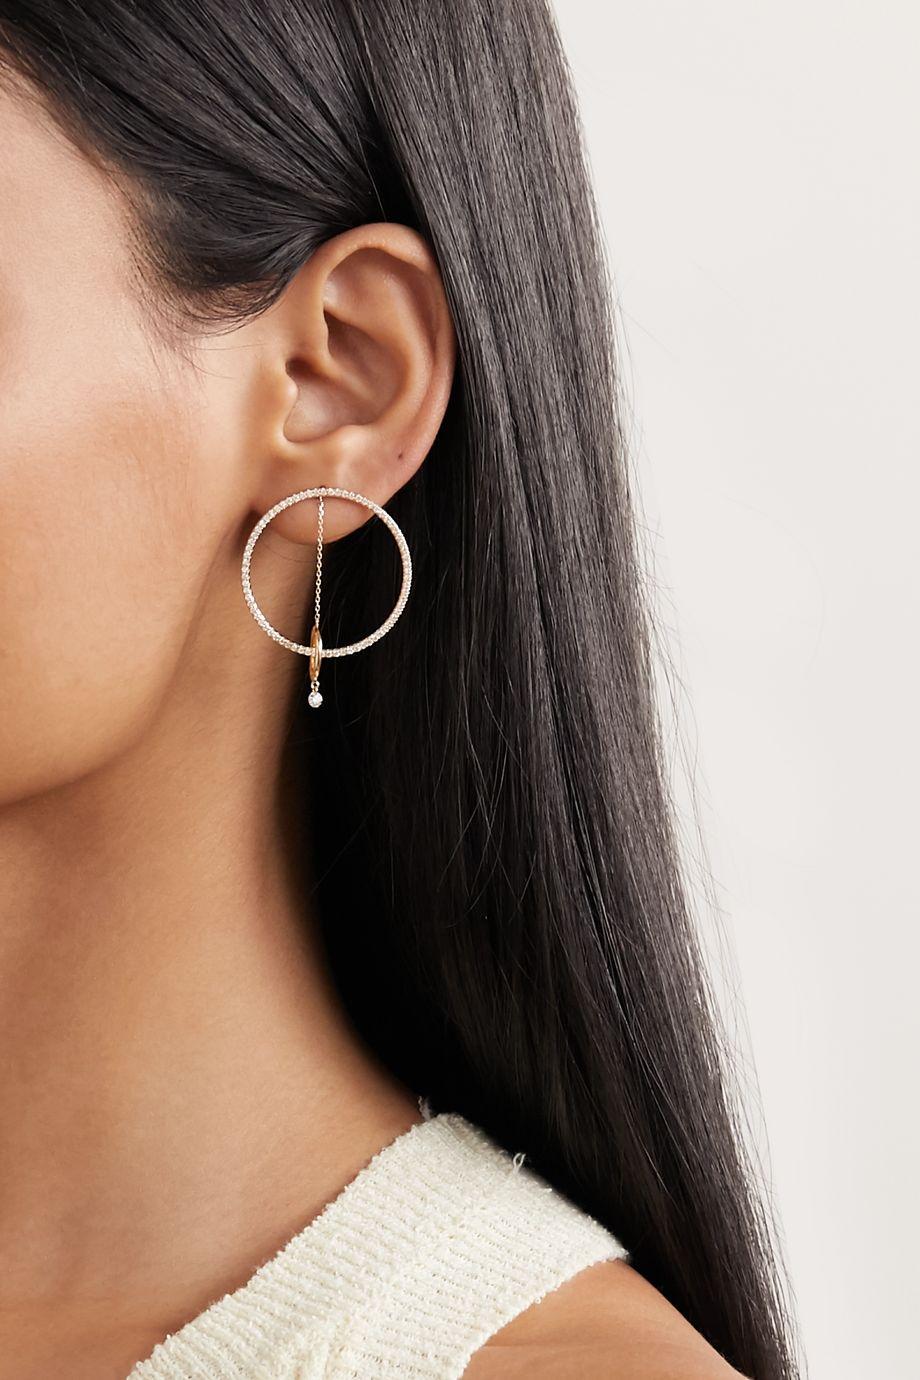 Persée Orbite Ohrring aus 18 Karat Gold mit Diamanten